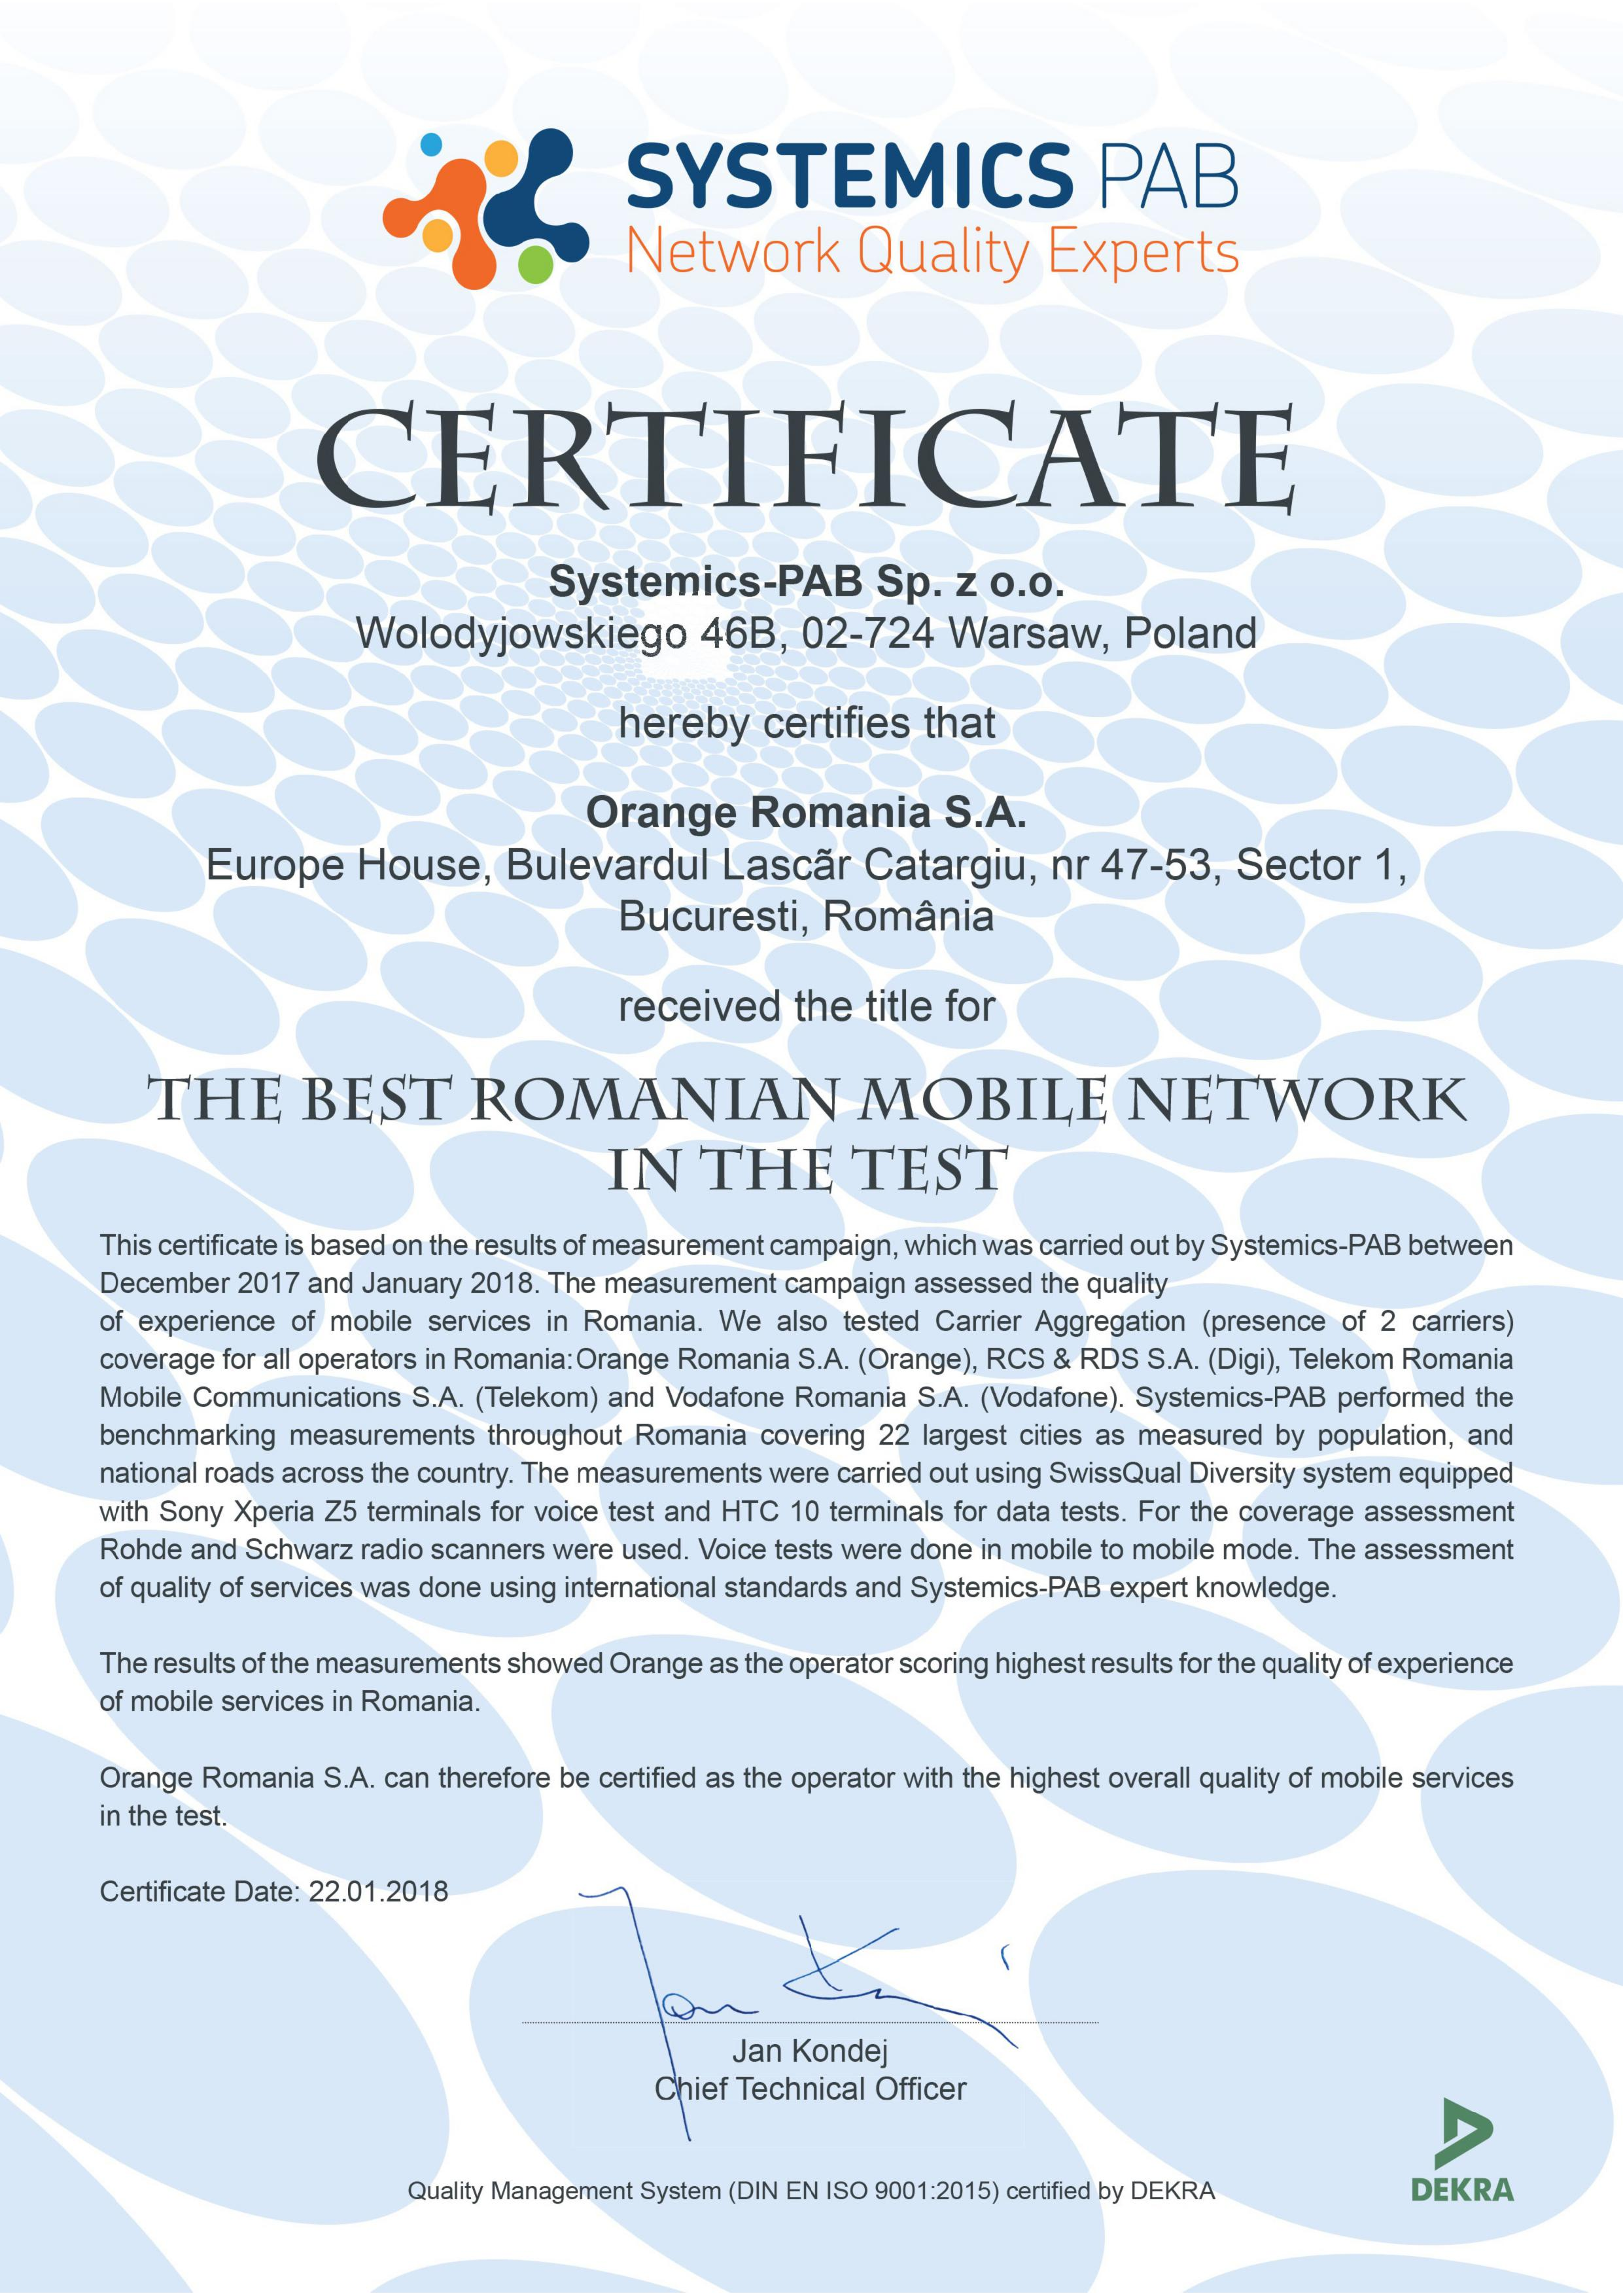 Certificare Systemics